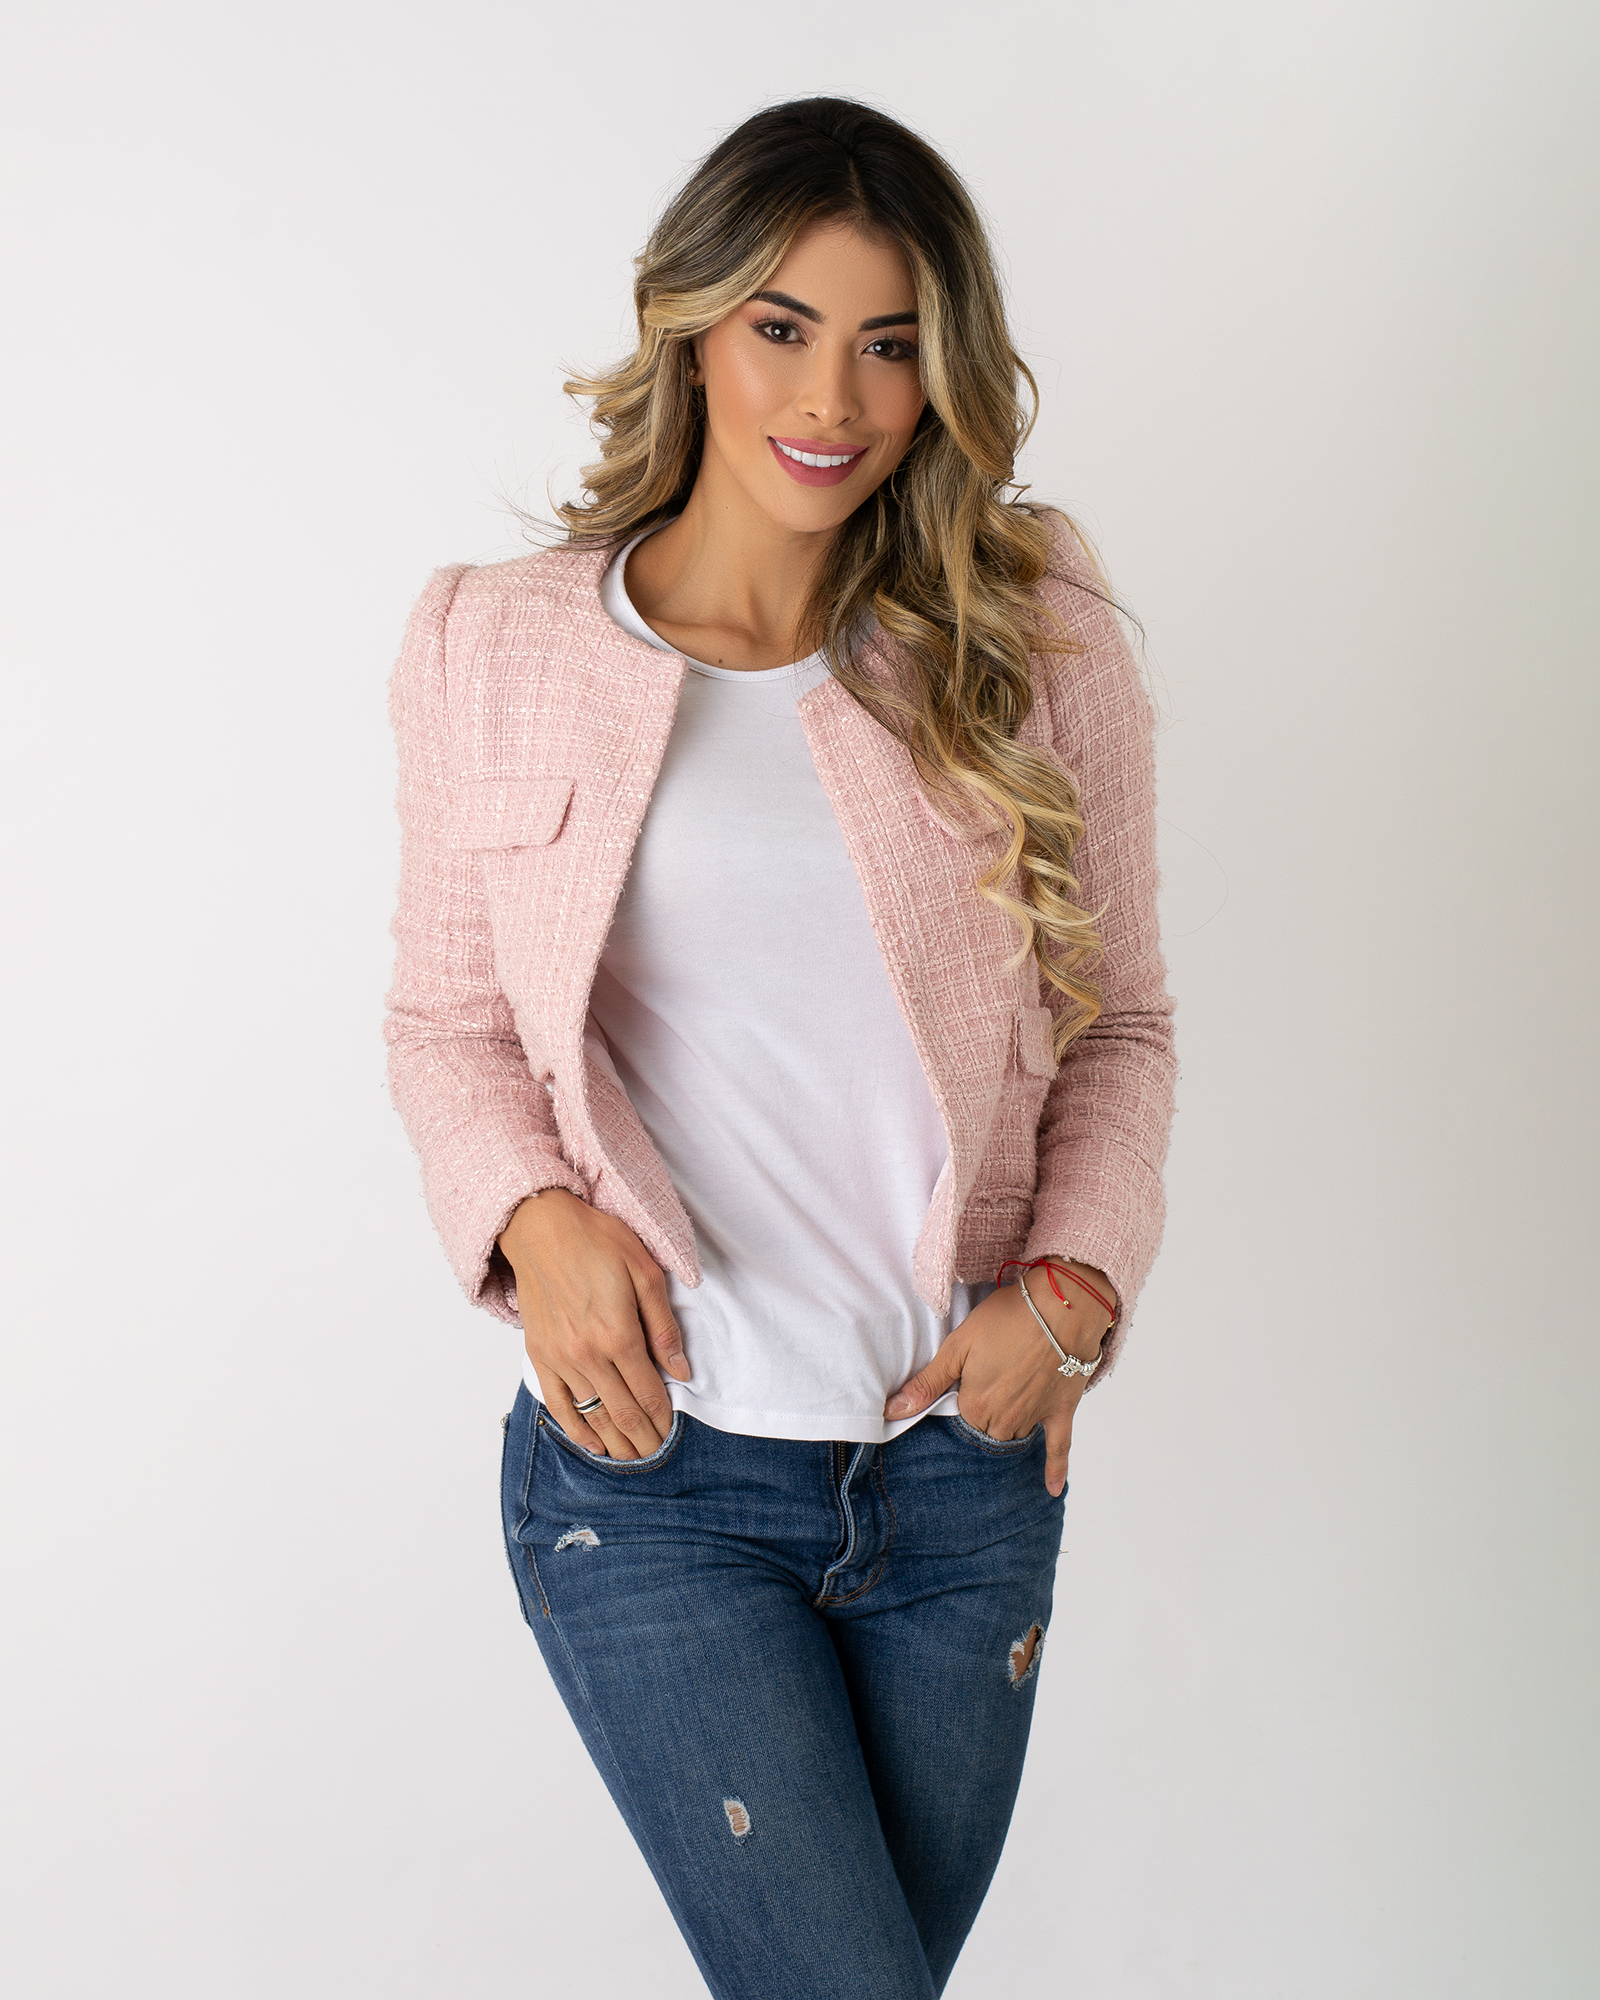 Vanessa Gallego 00